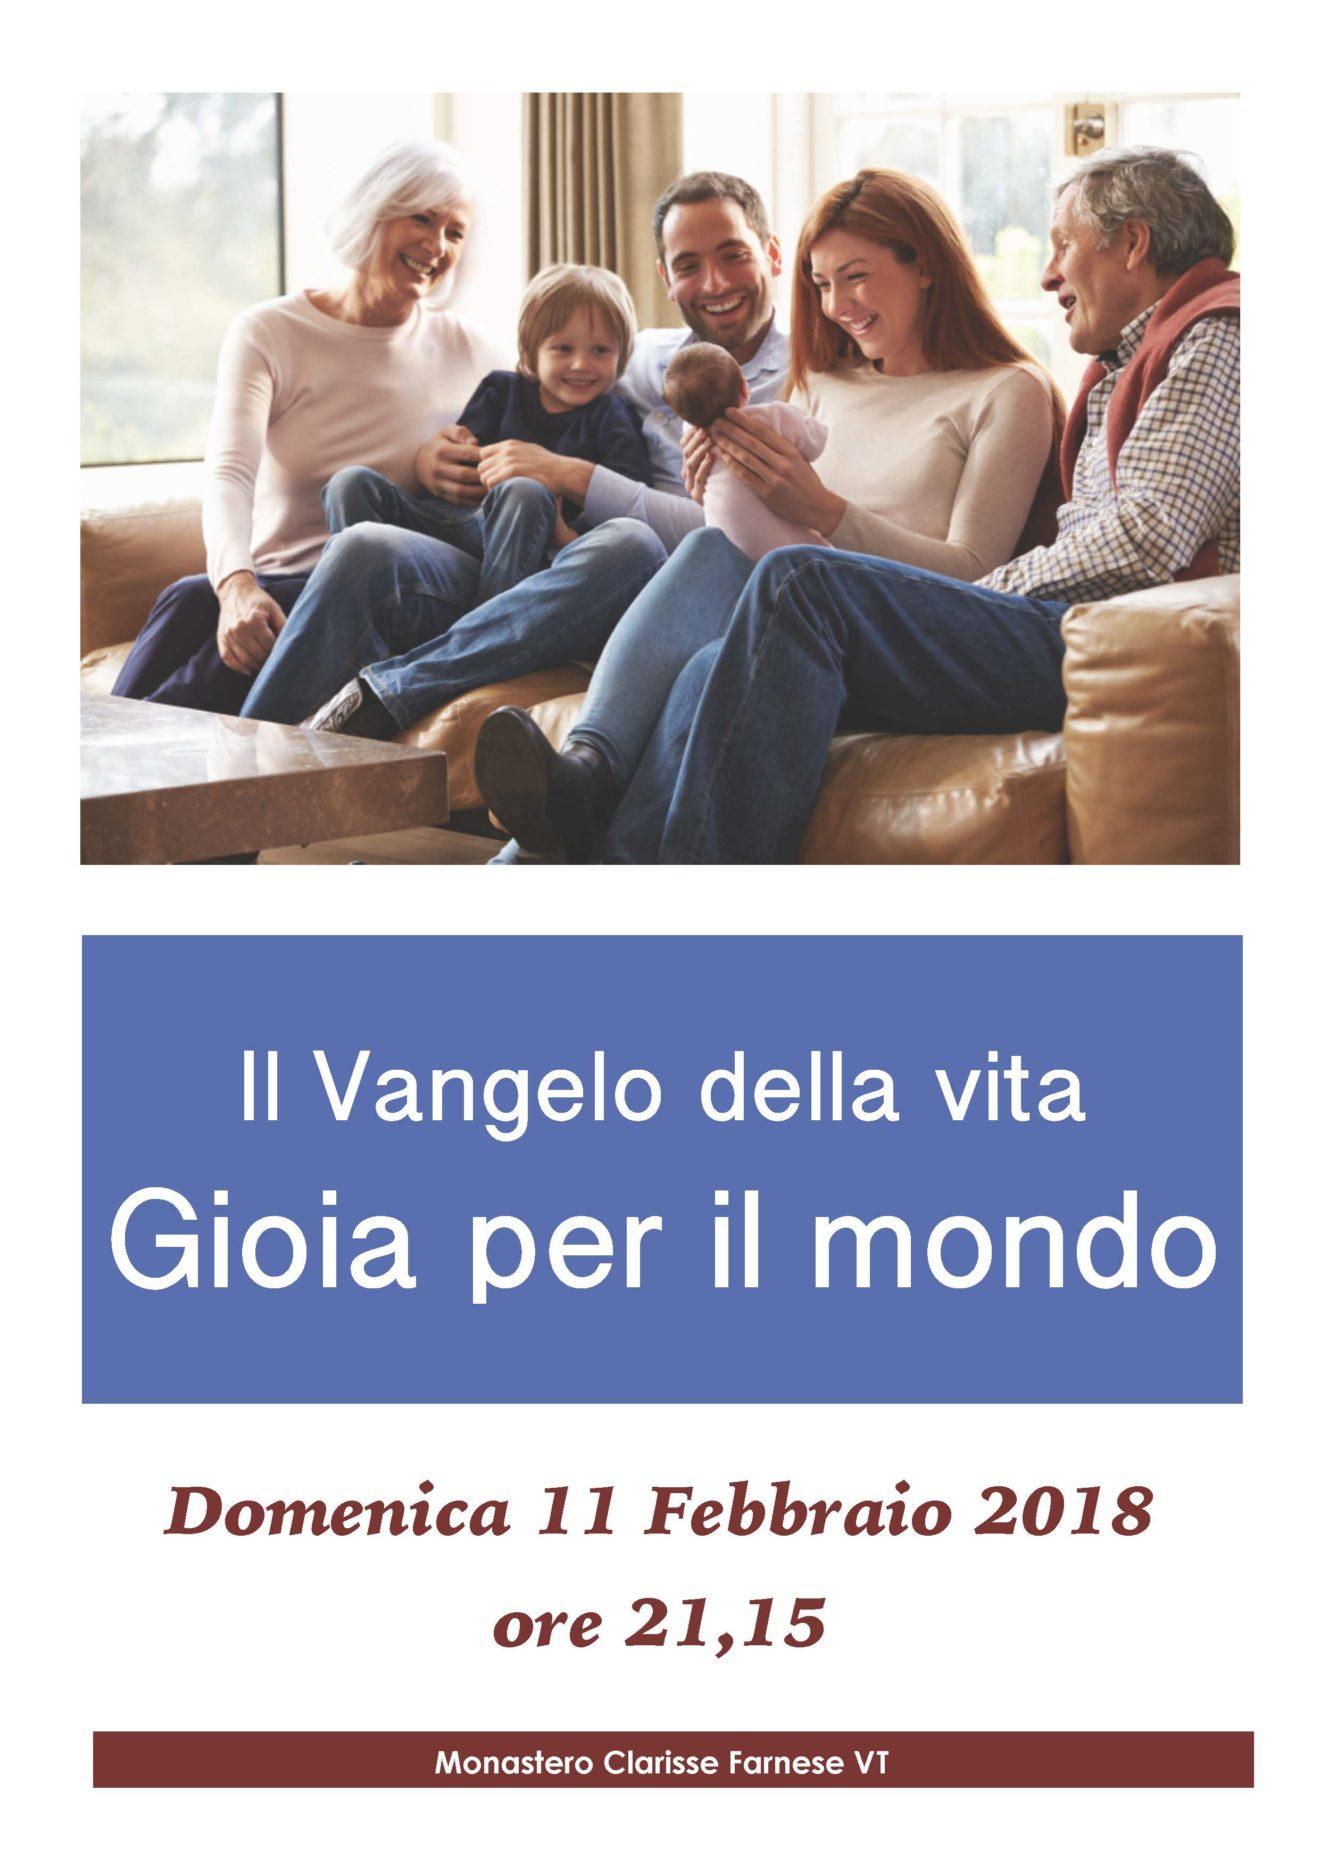 Manifesto 11 Febbraio 2018